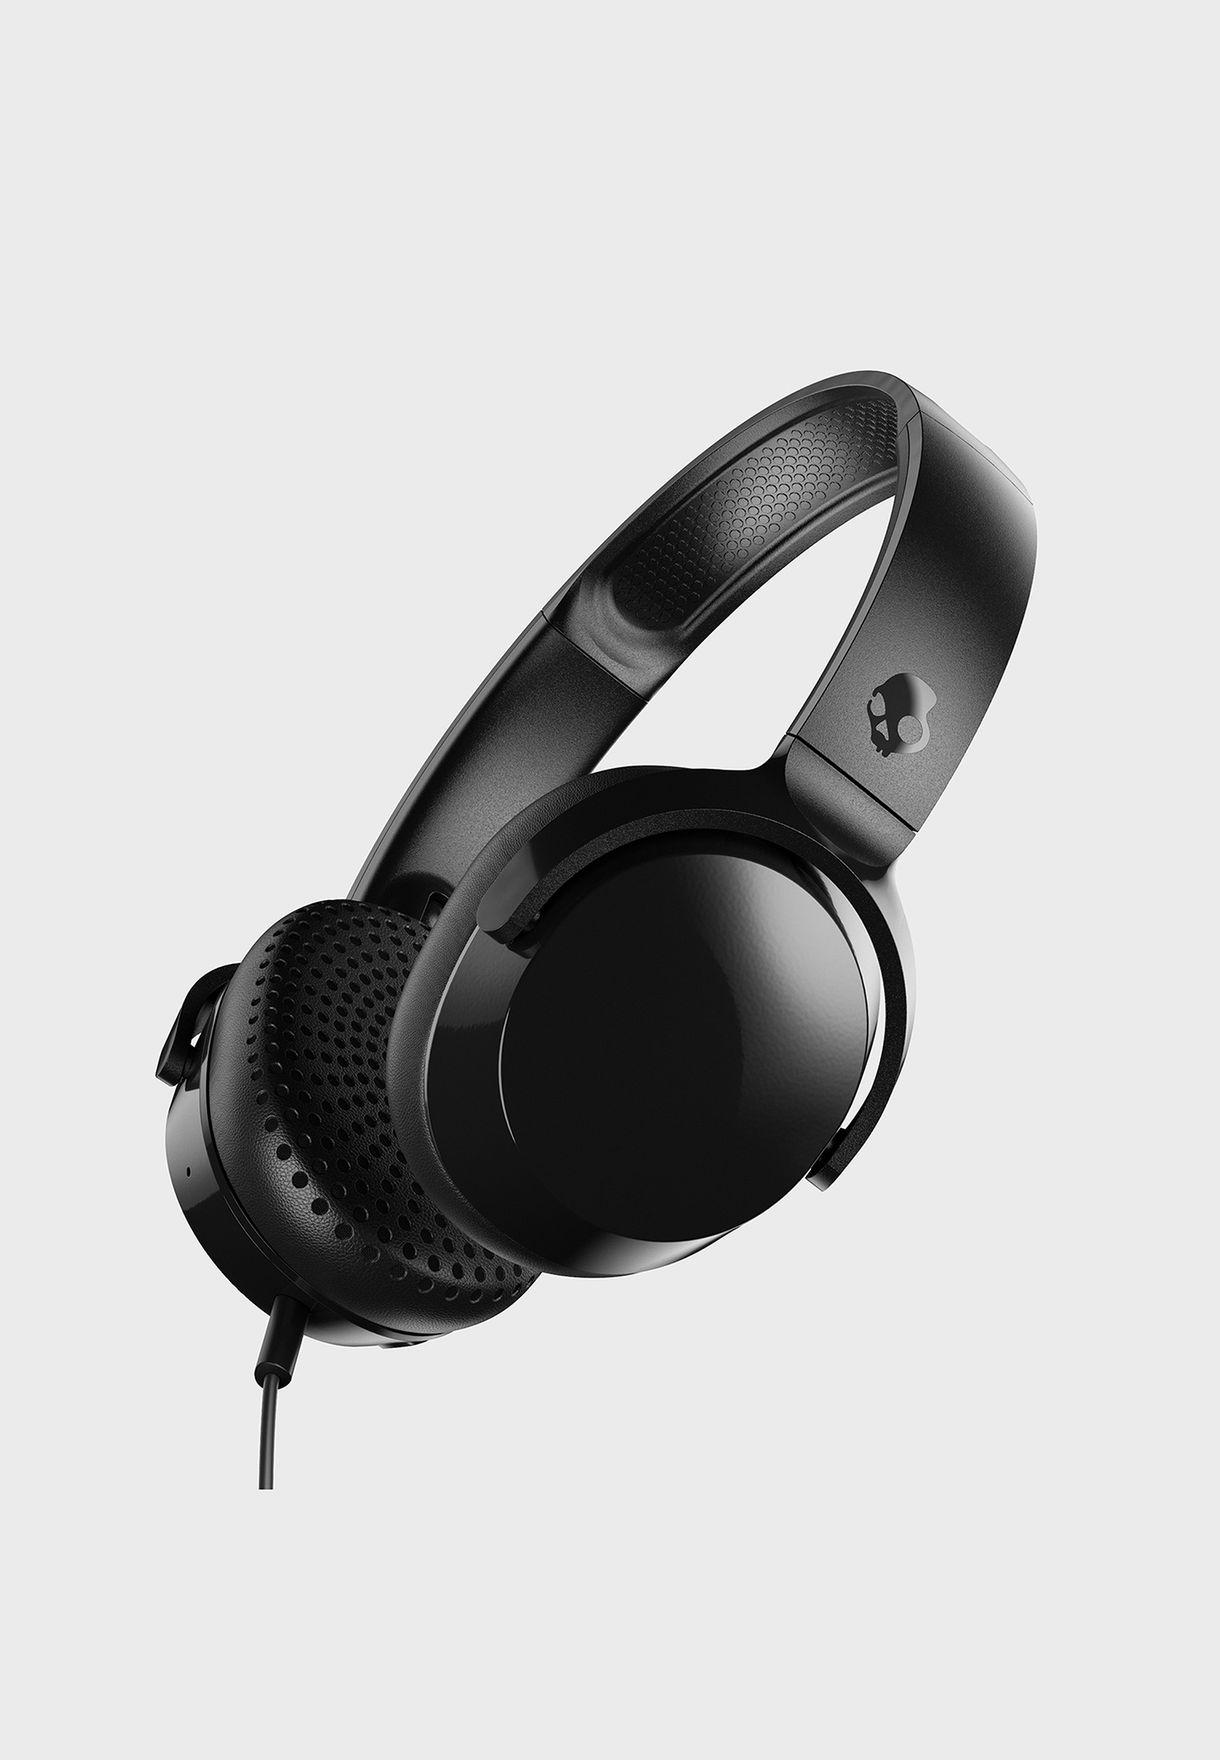 Riff On-Ear Headphone With Mic